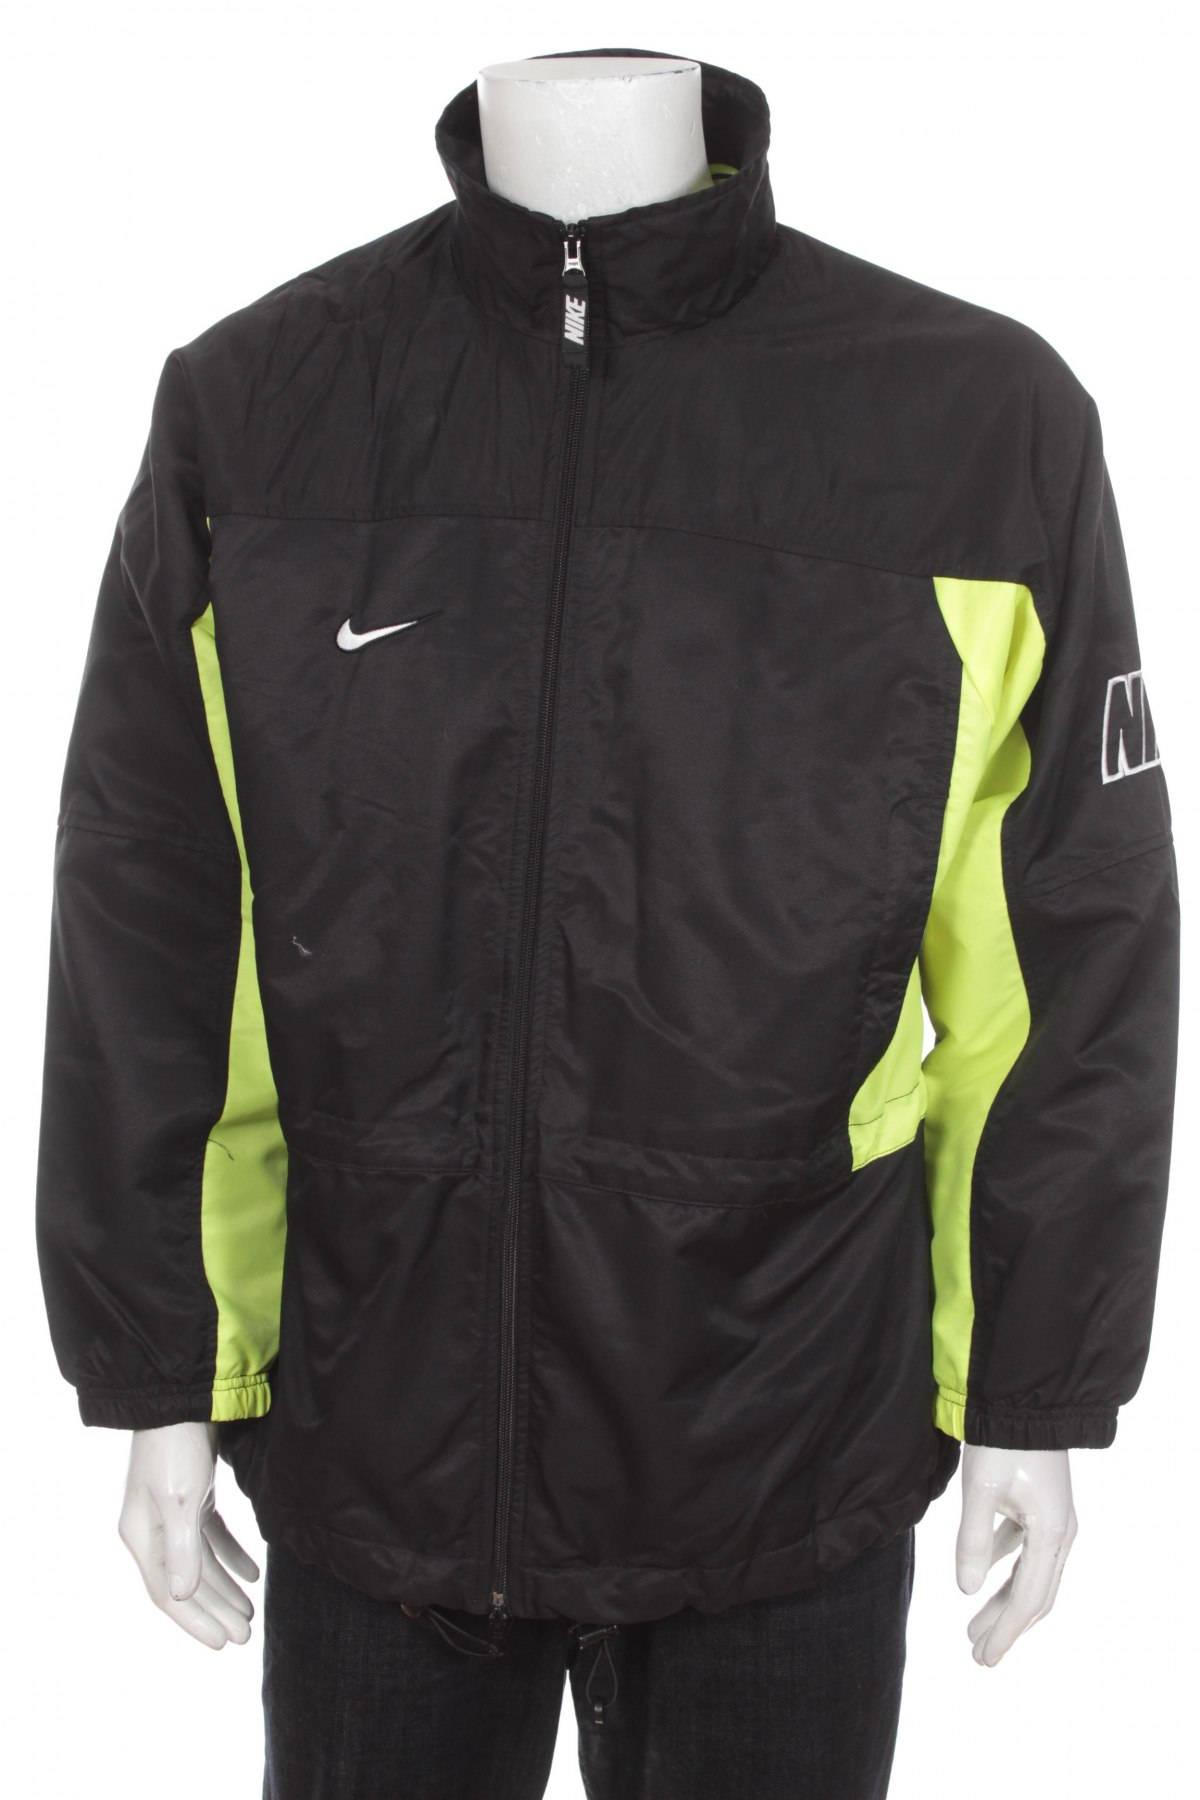 098770cefa Nike Windbreaker jacket Nylon Shell Jacket Big Logo Spell Out